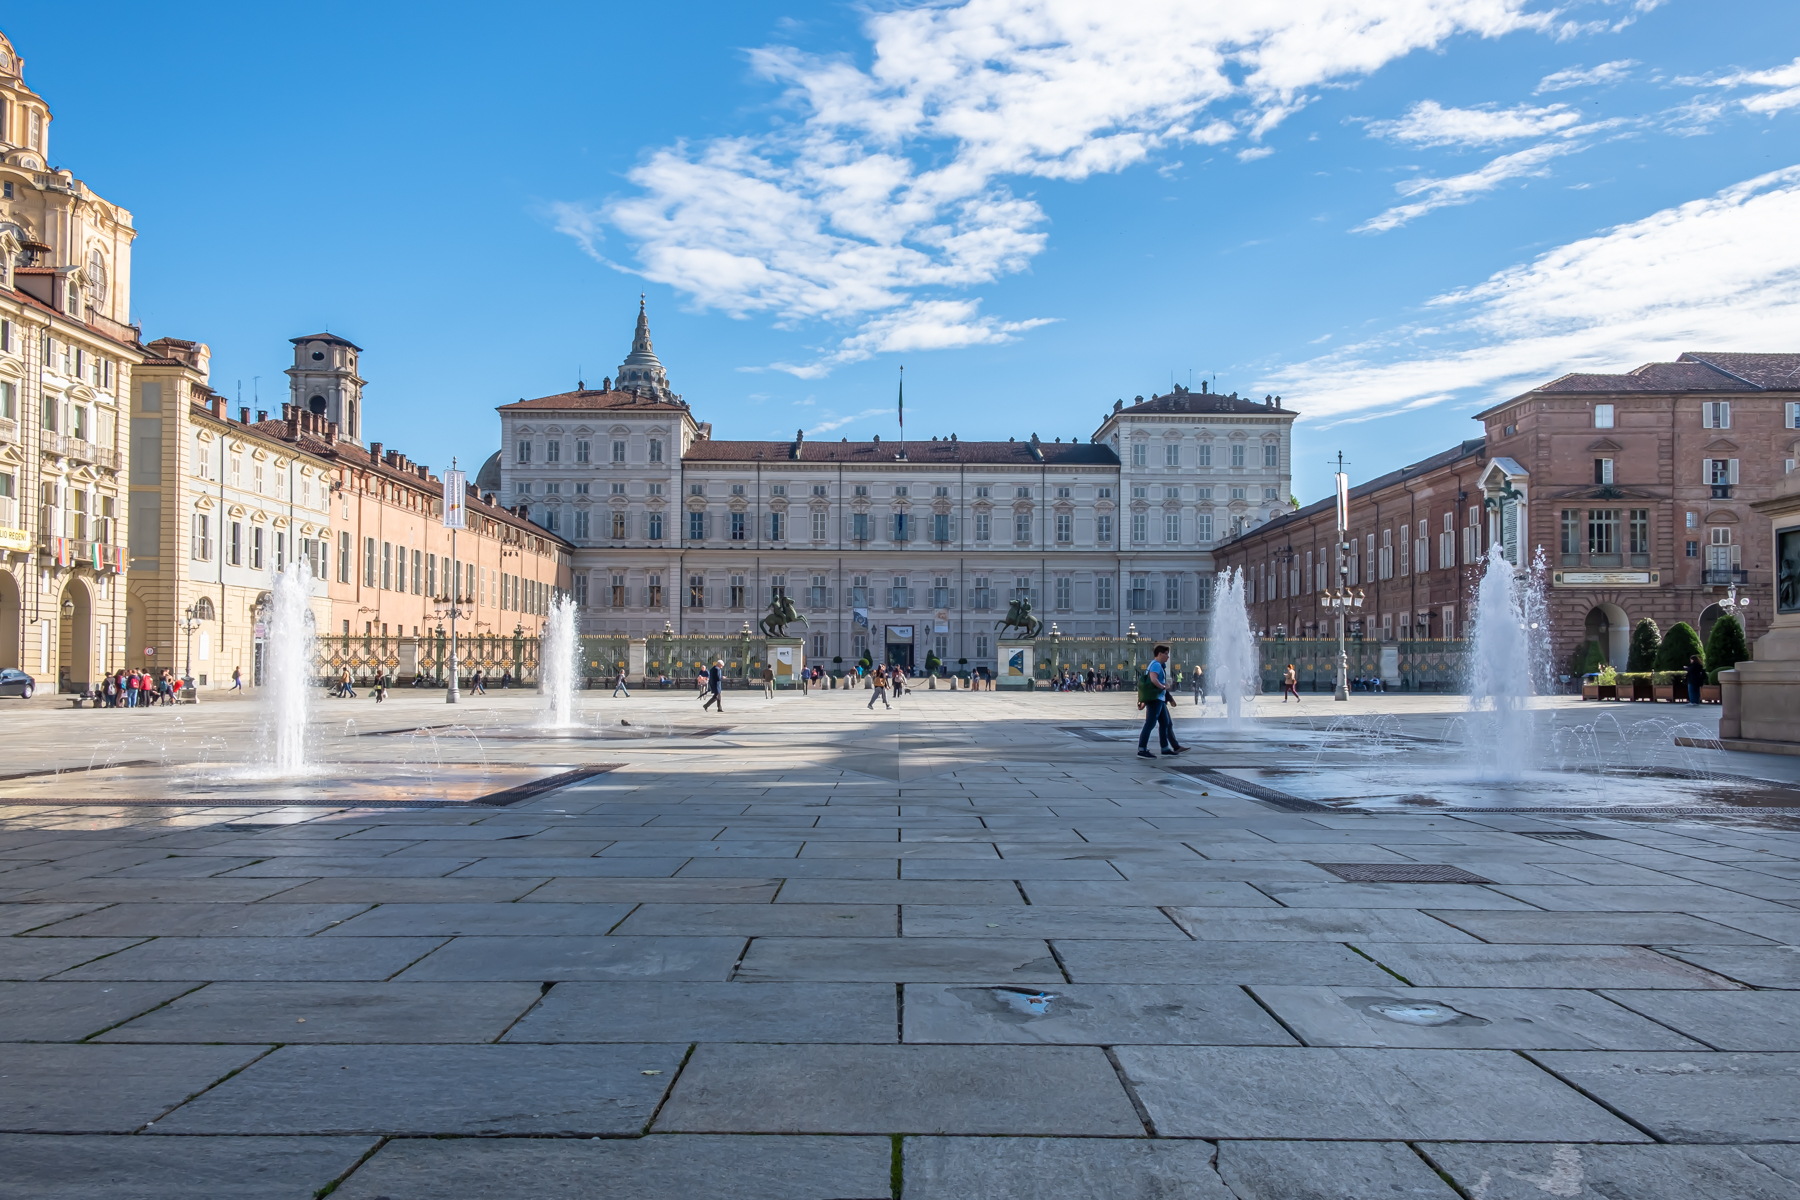 fuji xt20 - Palazzo Reale di Torino